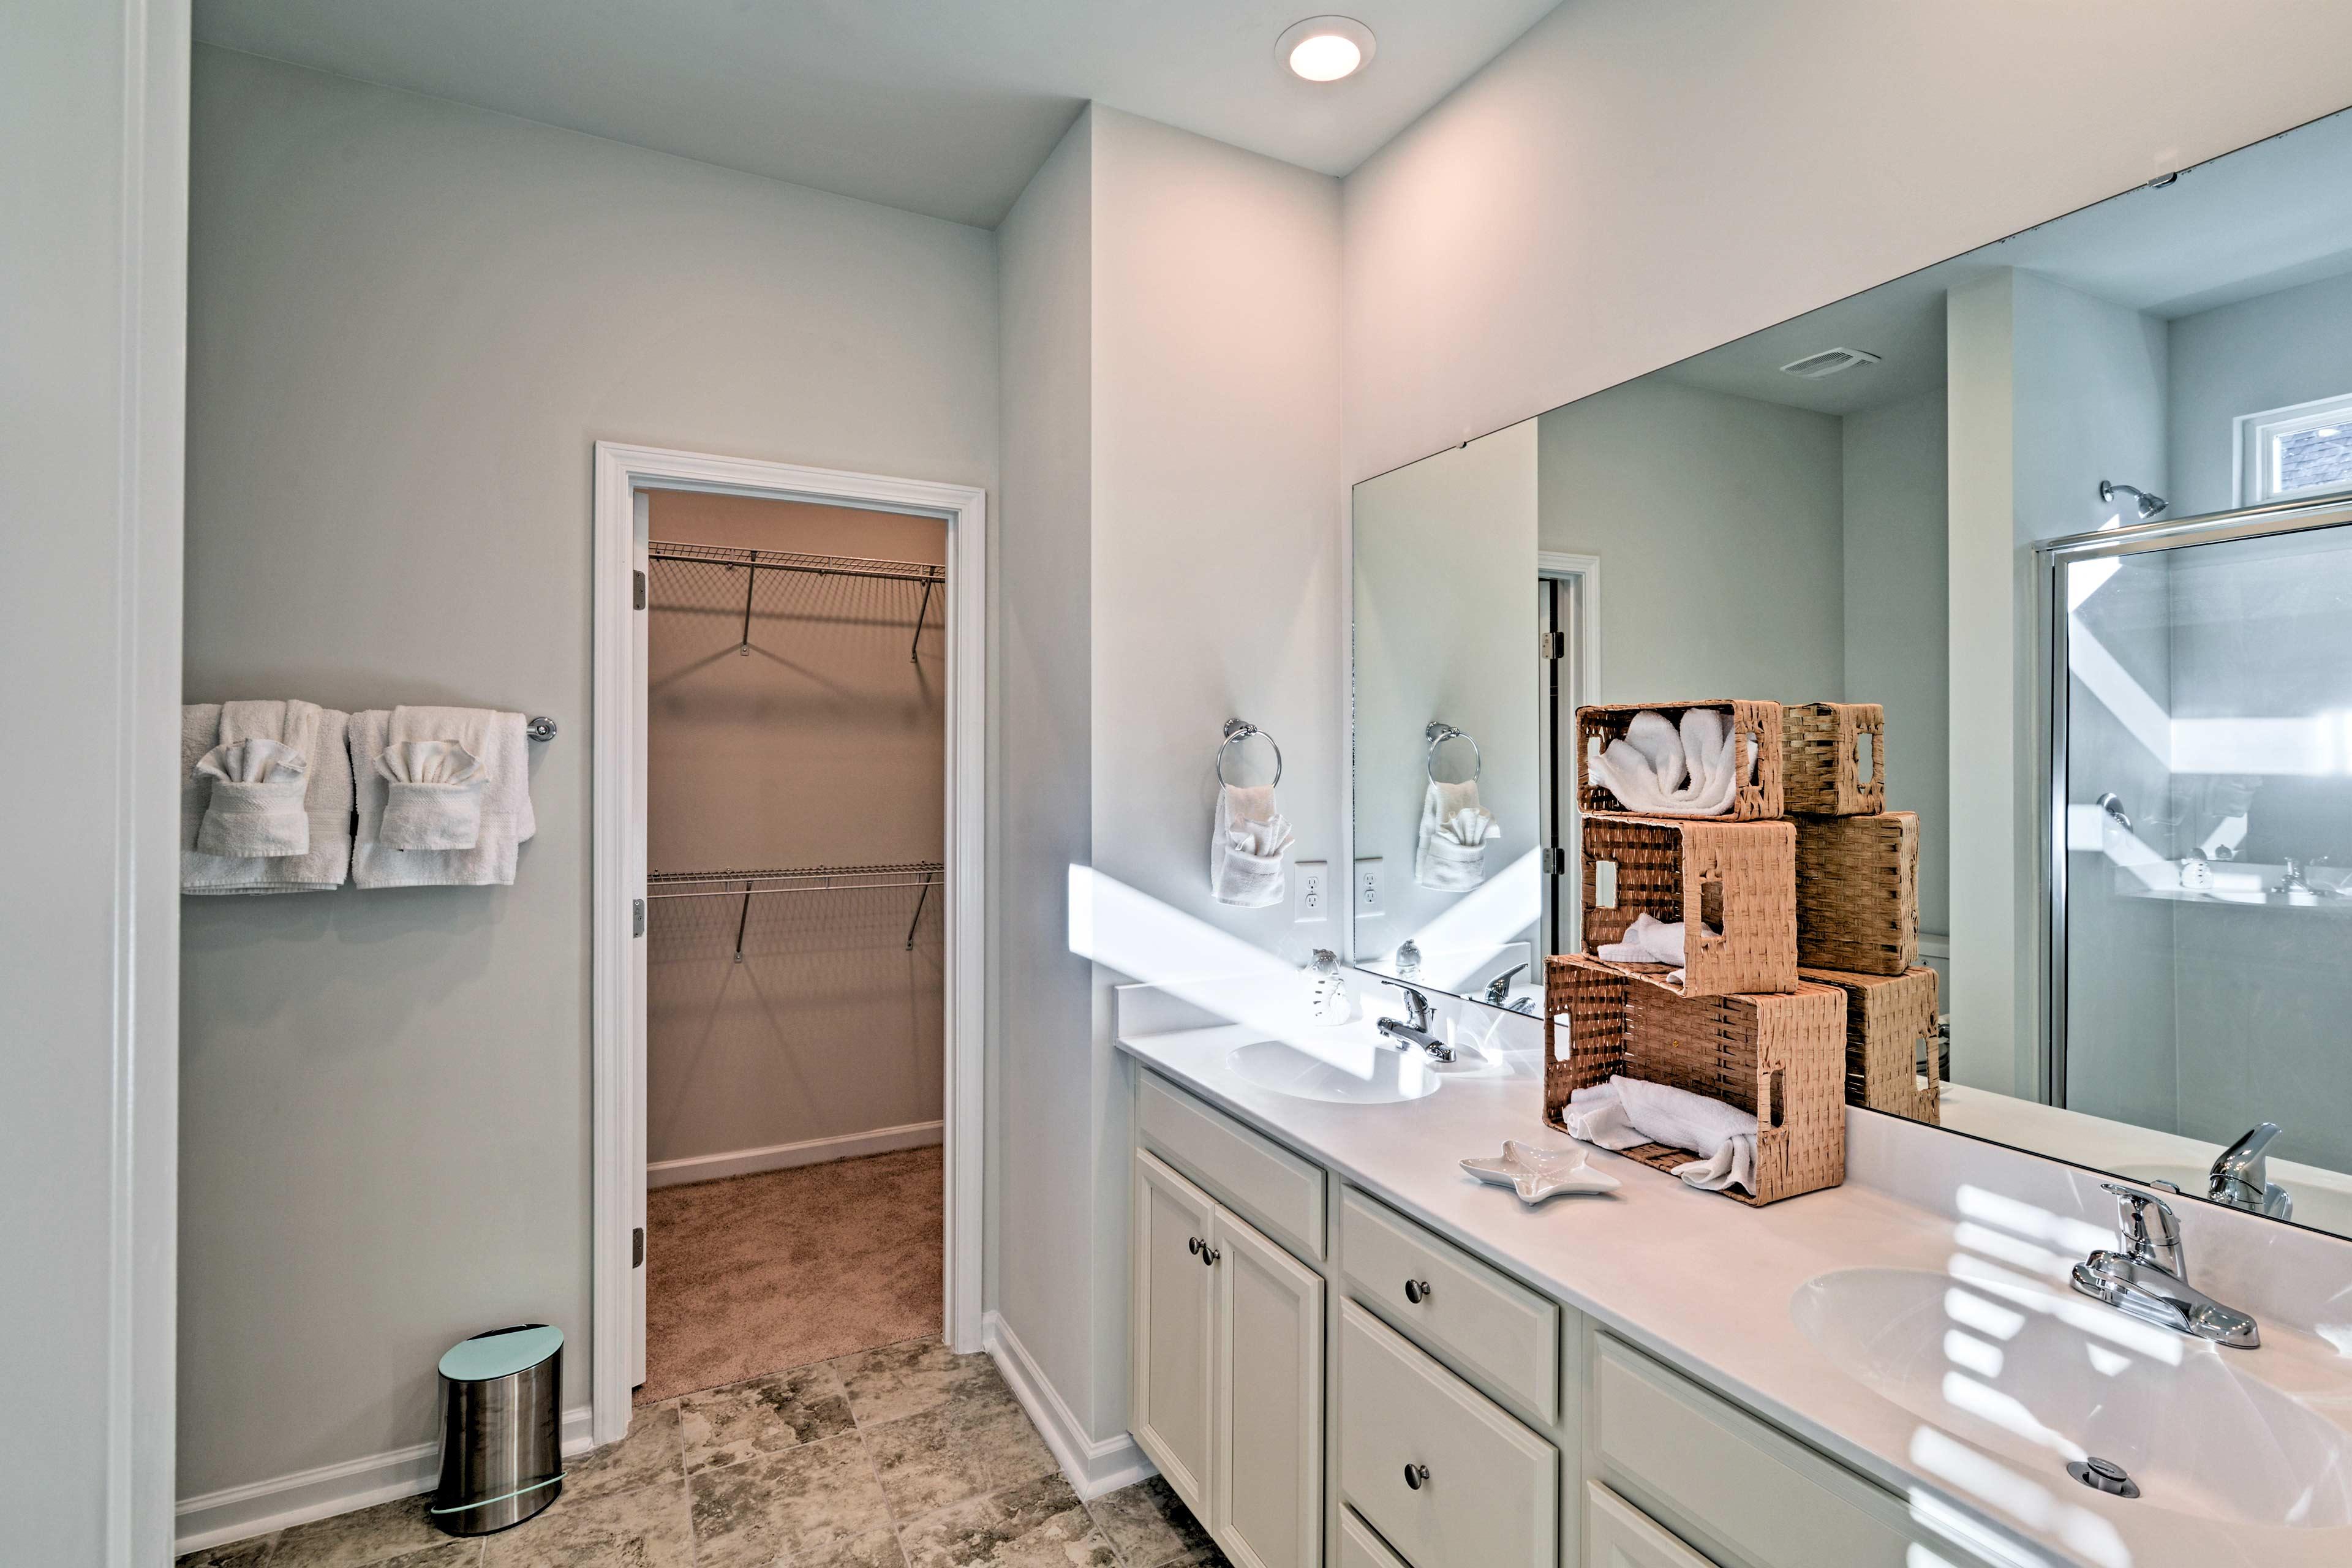 Rinse up before bed in the master en-suite bathroom.